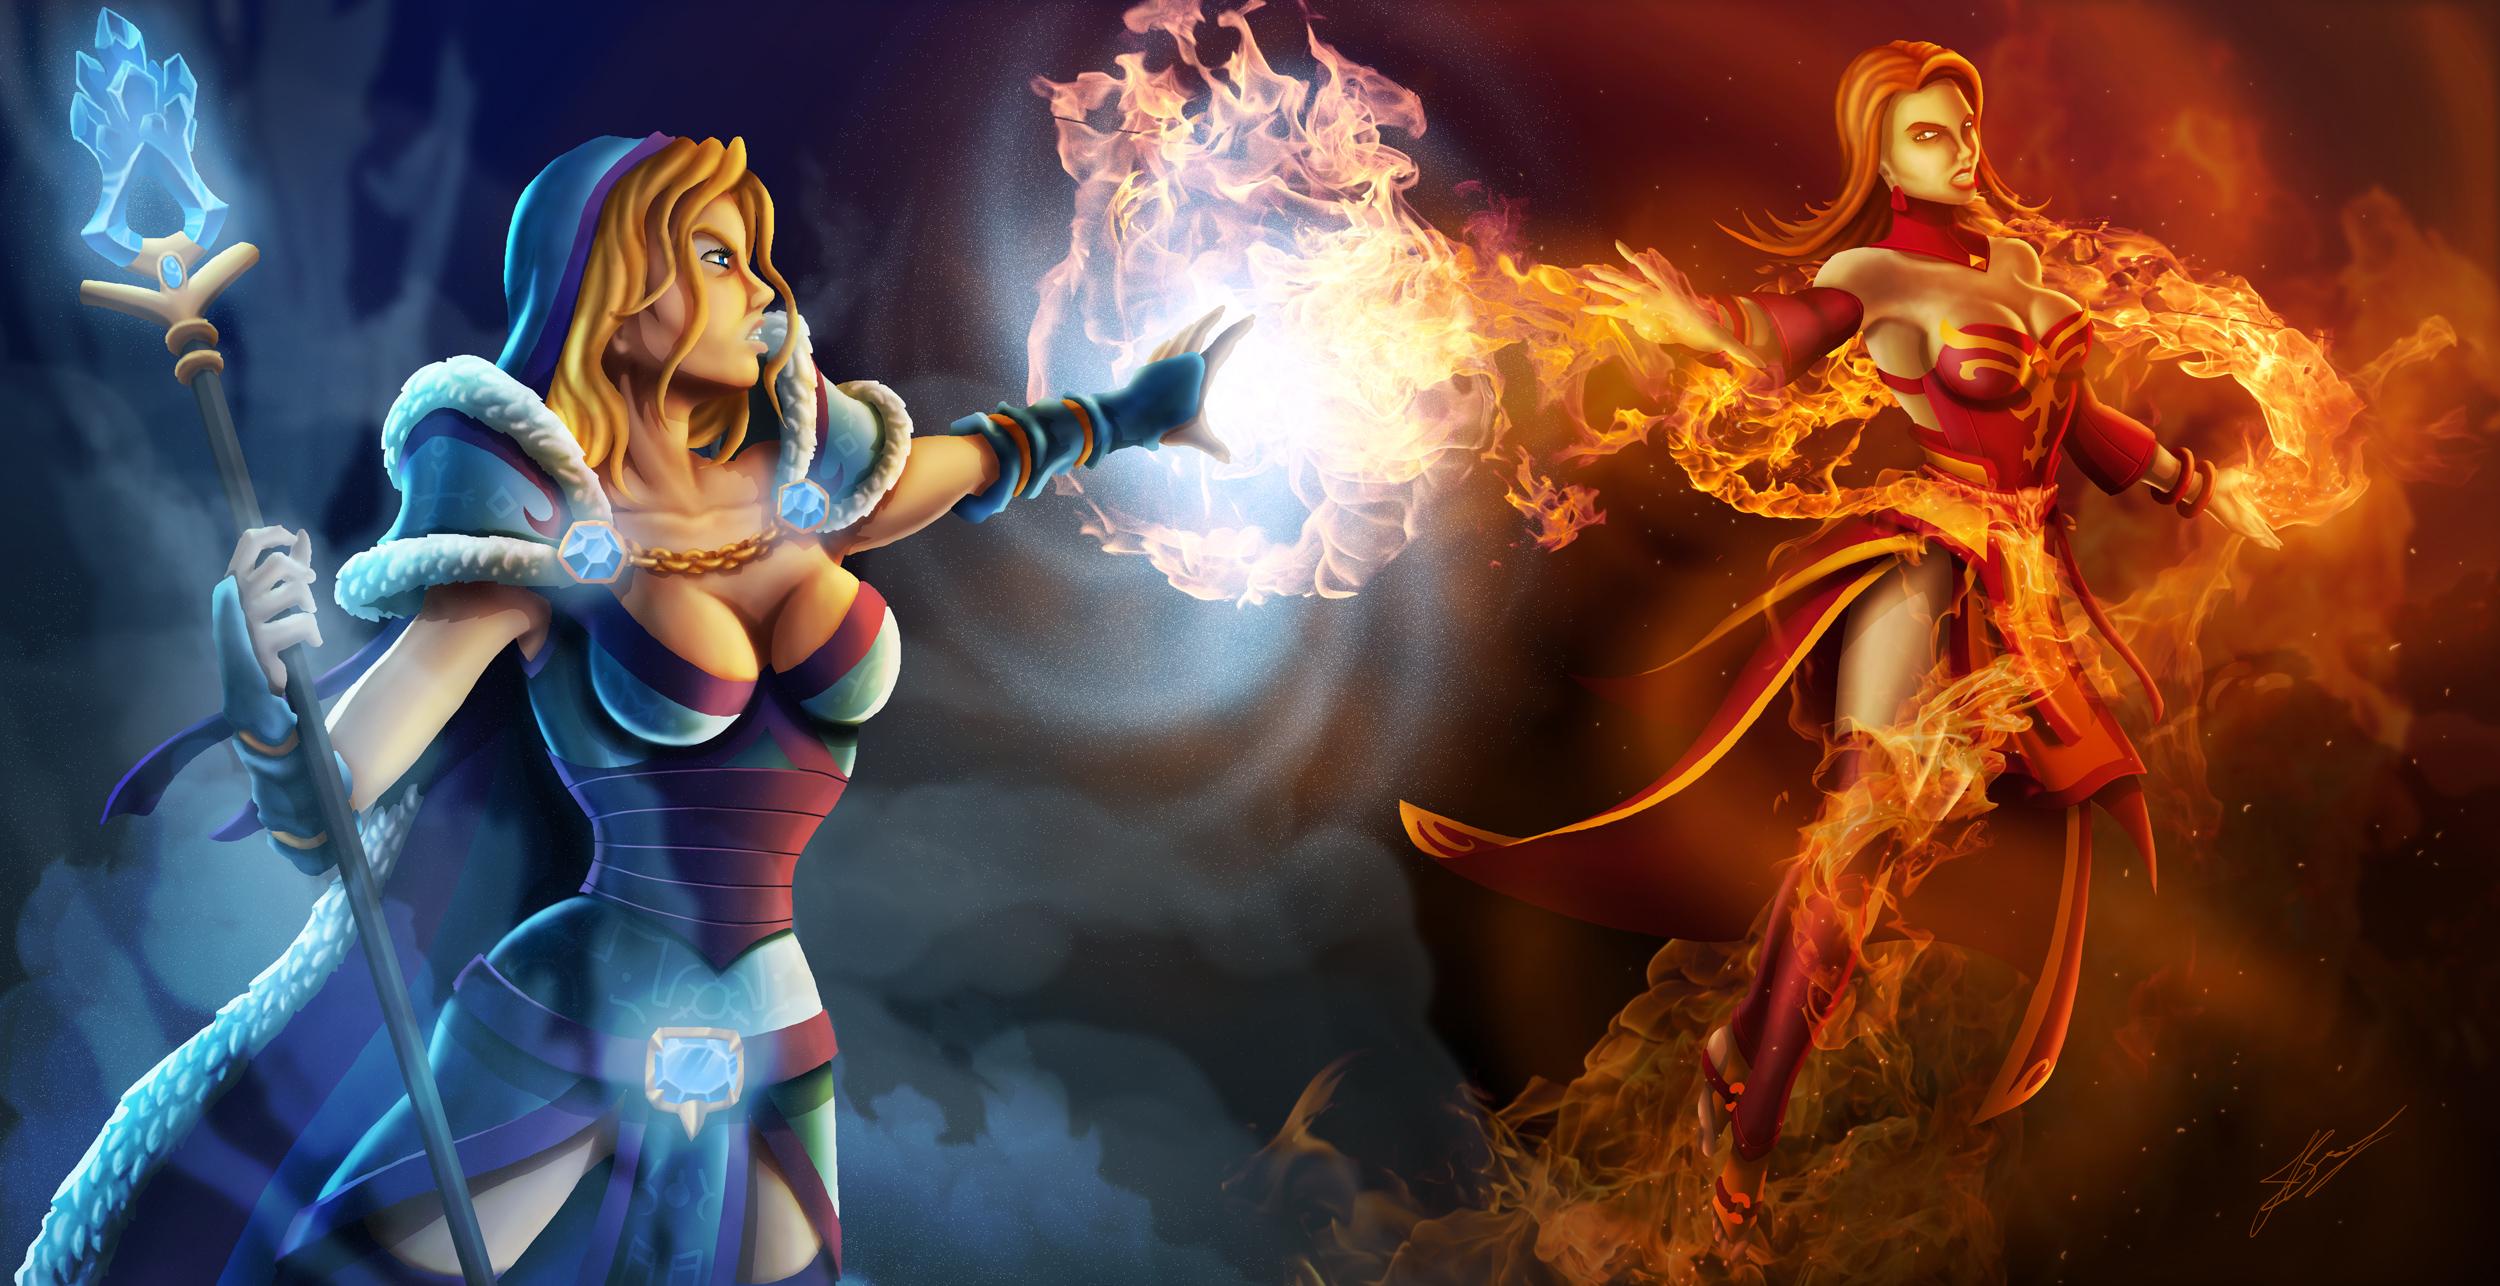 Crystal Maiden Vs. Lina